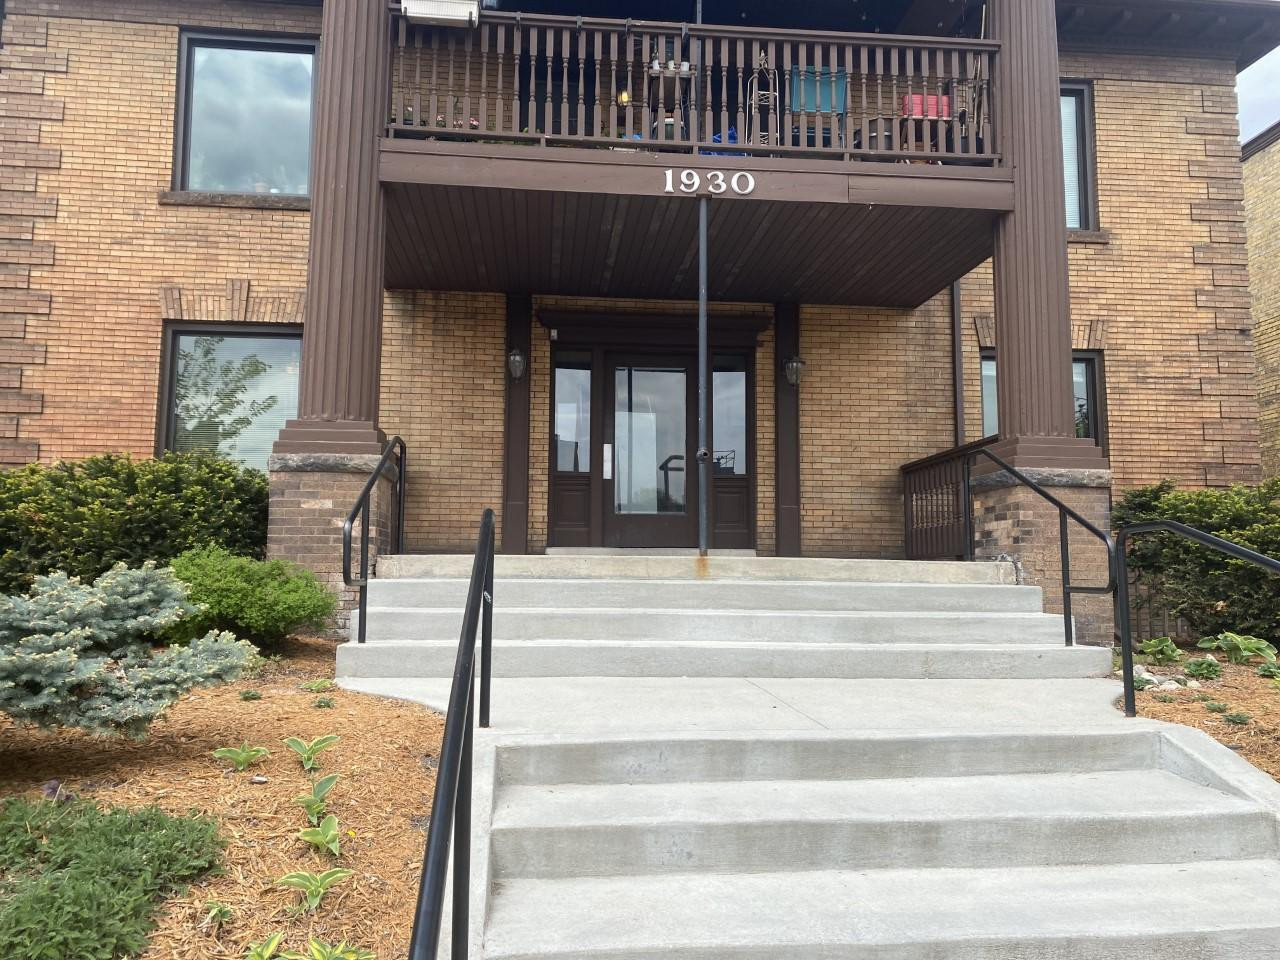 1930 Aldrich Avenue S, C201, Minneapolis, MN 55403